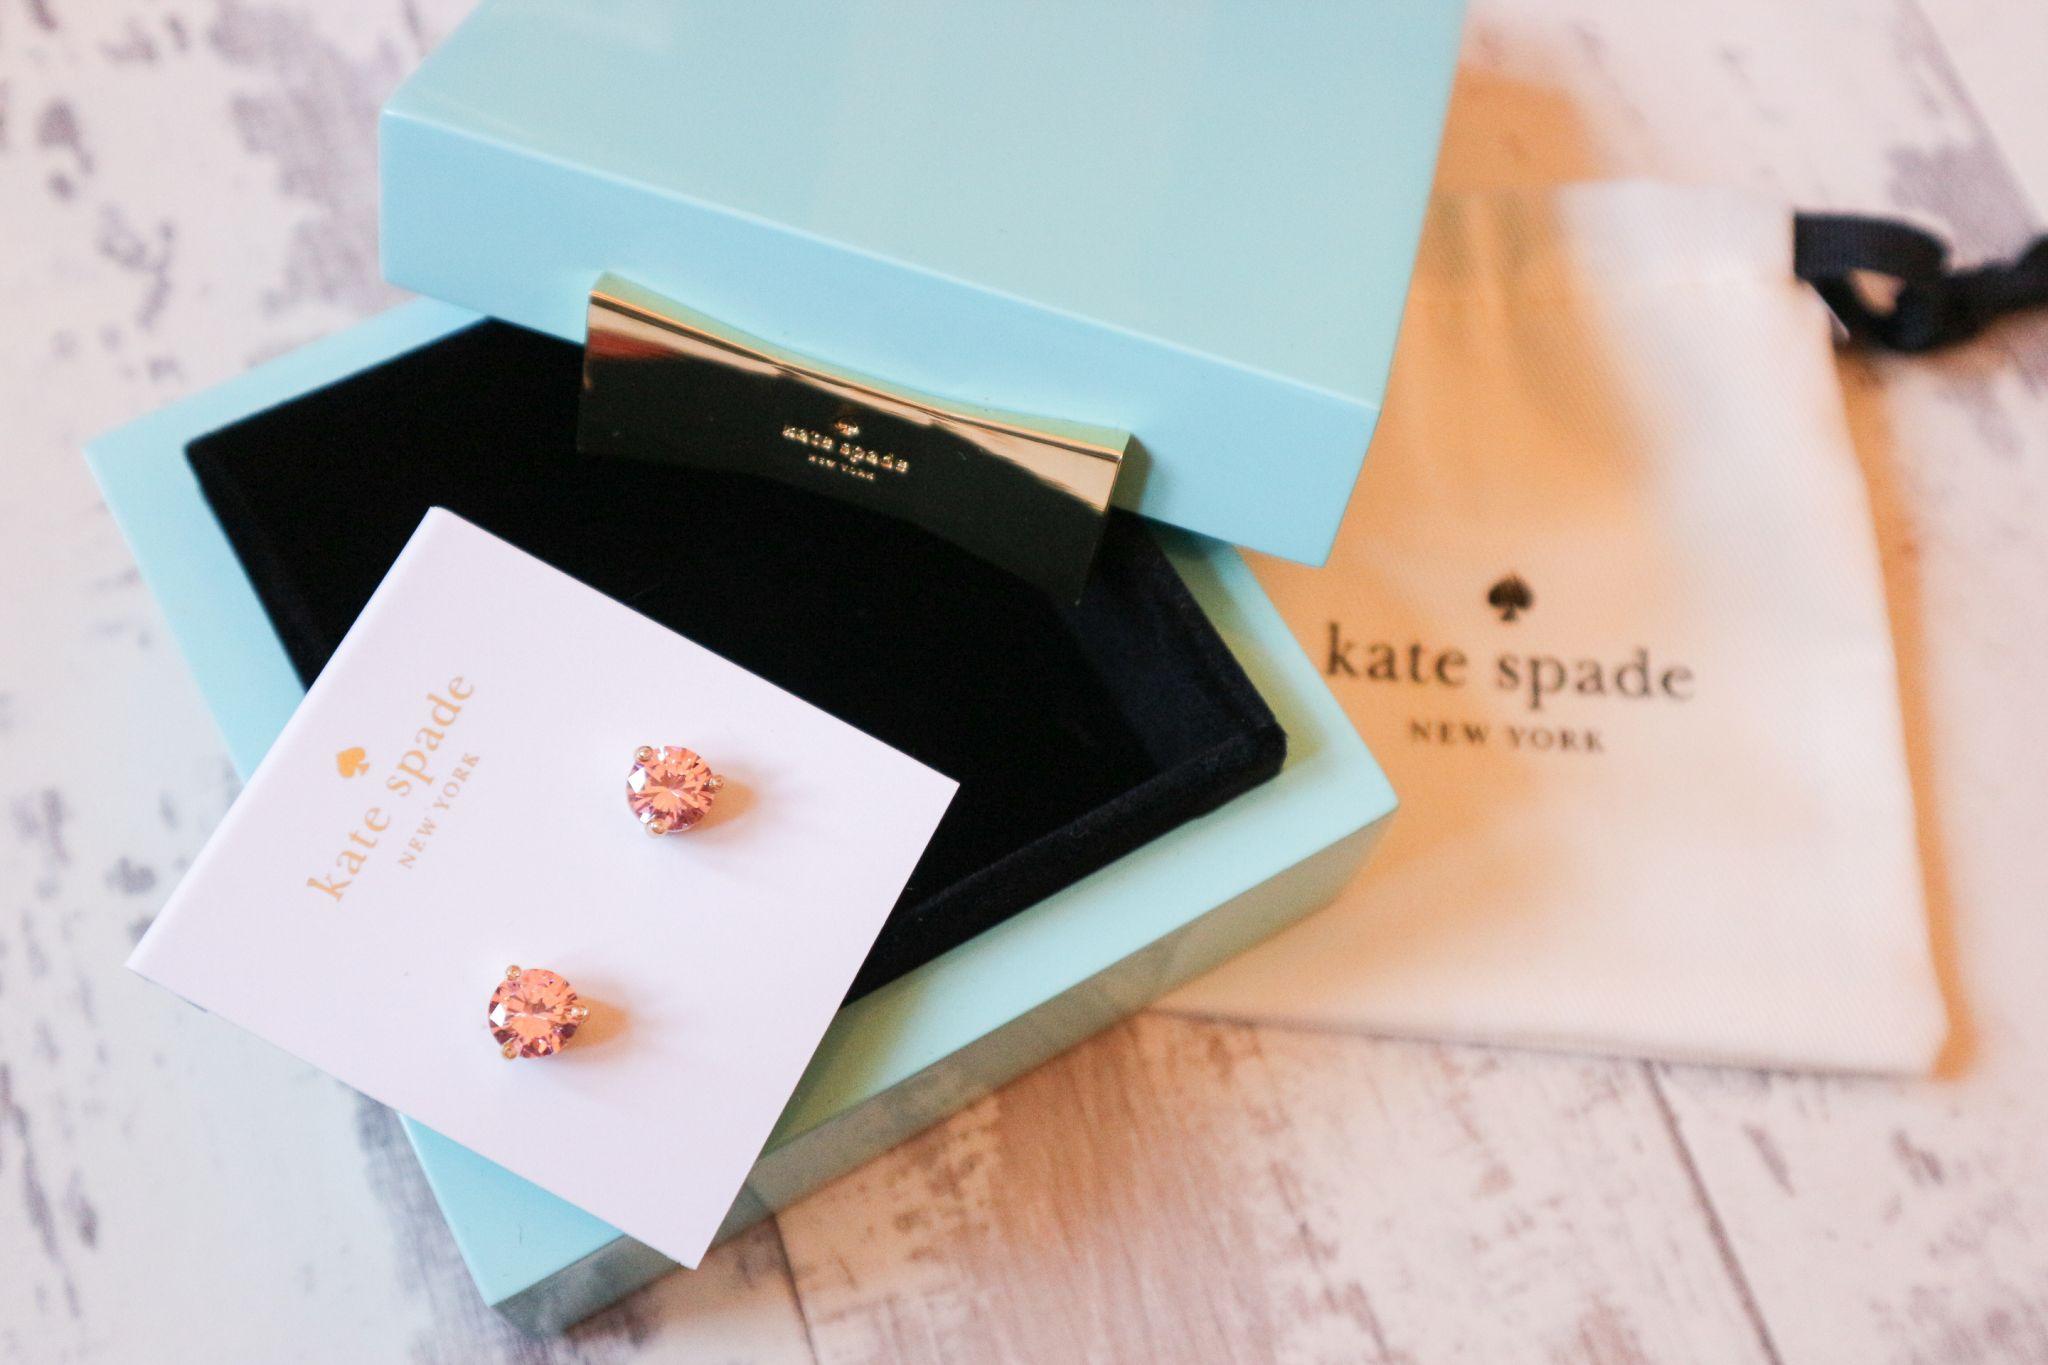 kate spade earrings and trinket box